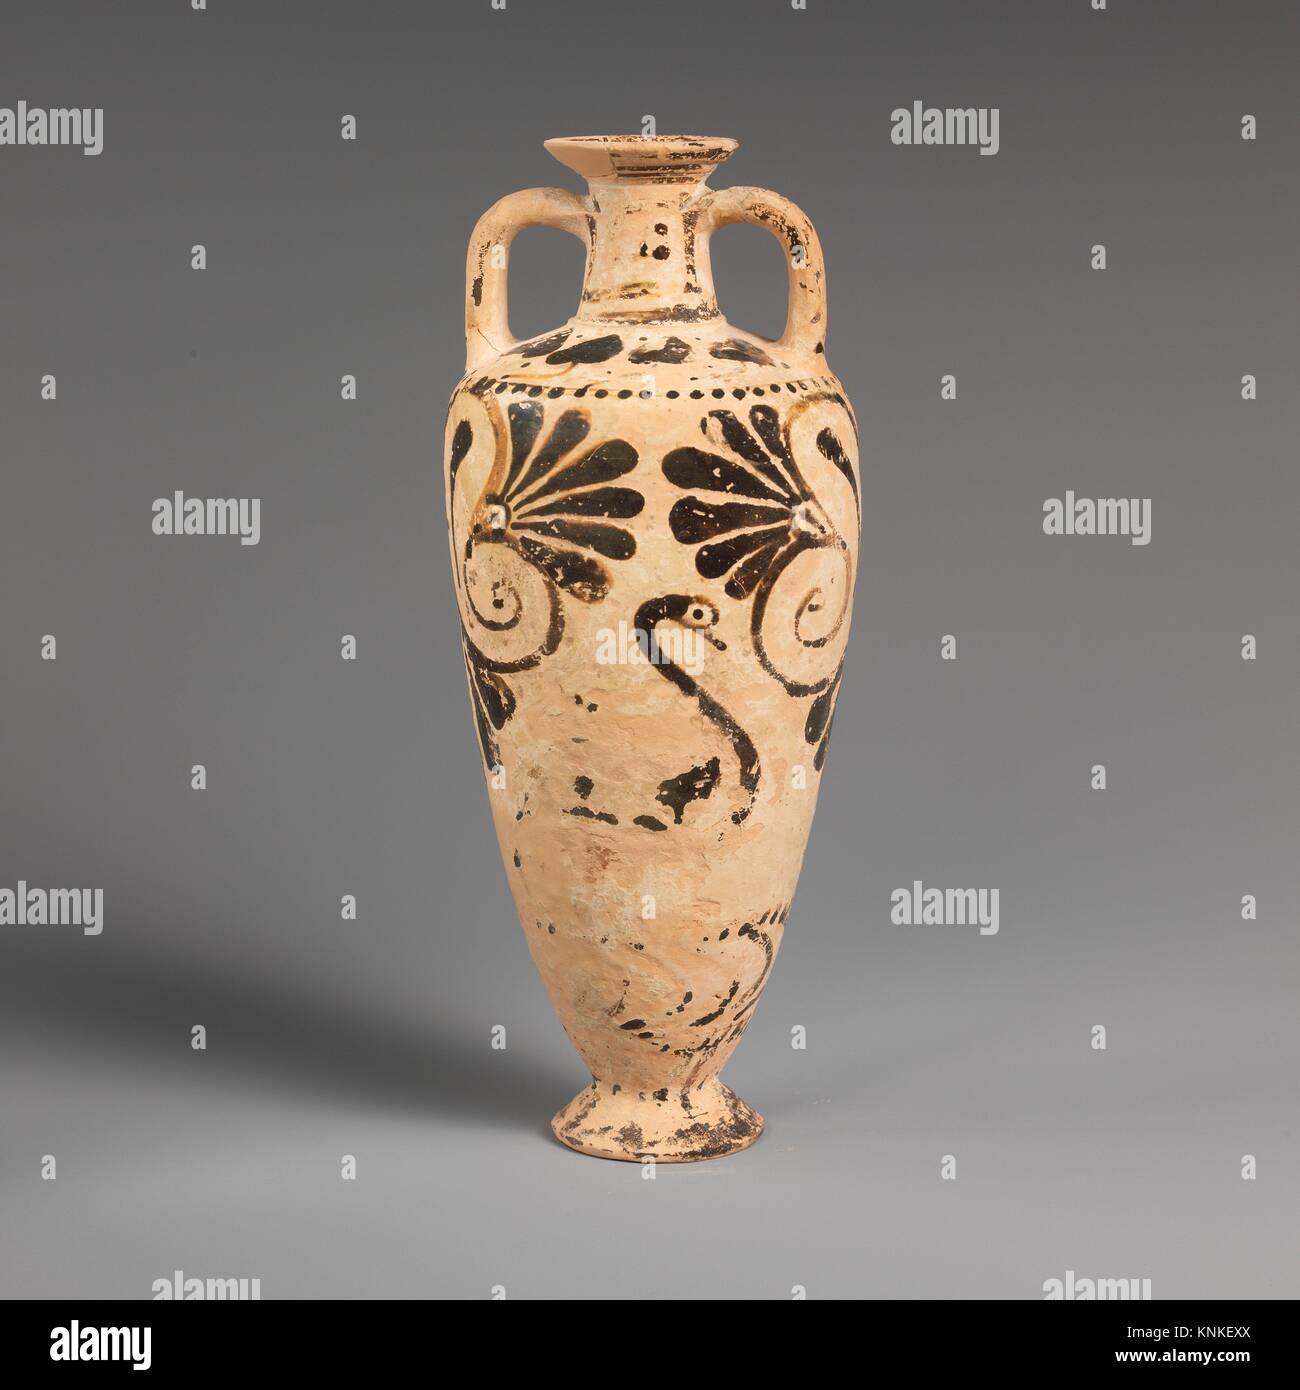 Terracotta amphoriskos (oil flask). Period: Archaic; Date: ca. 550-525 B.C; Culture: East Greek, Milesian, Fikellura; Stock Photo